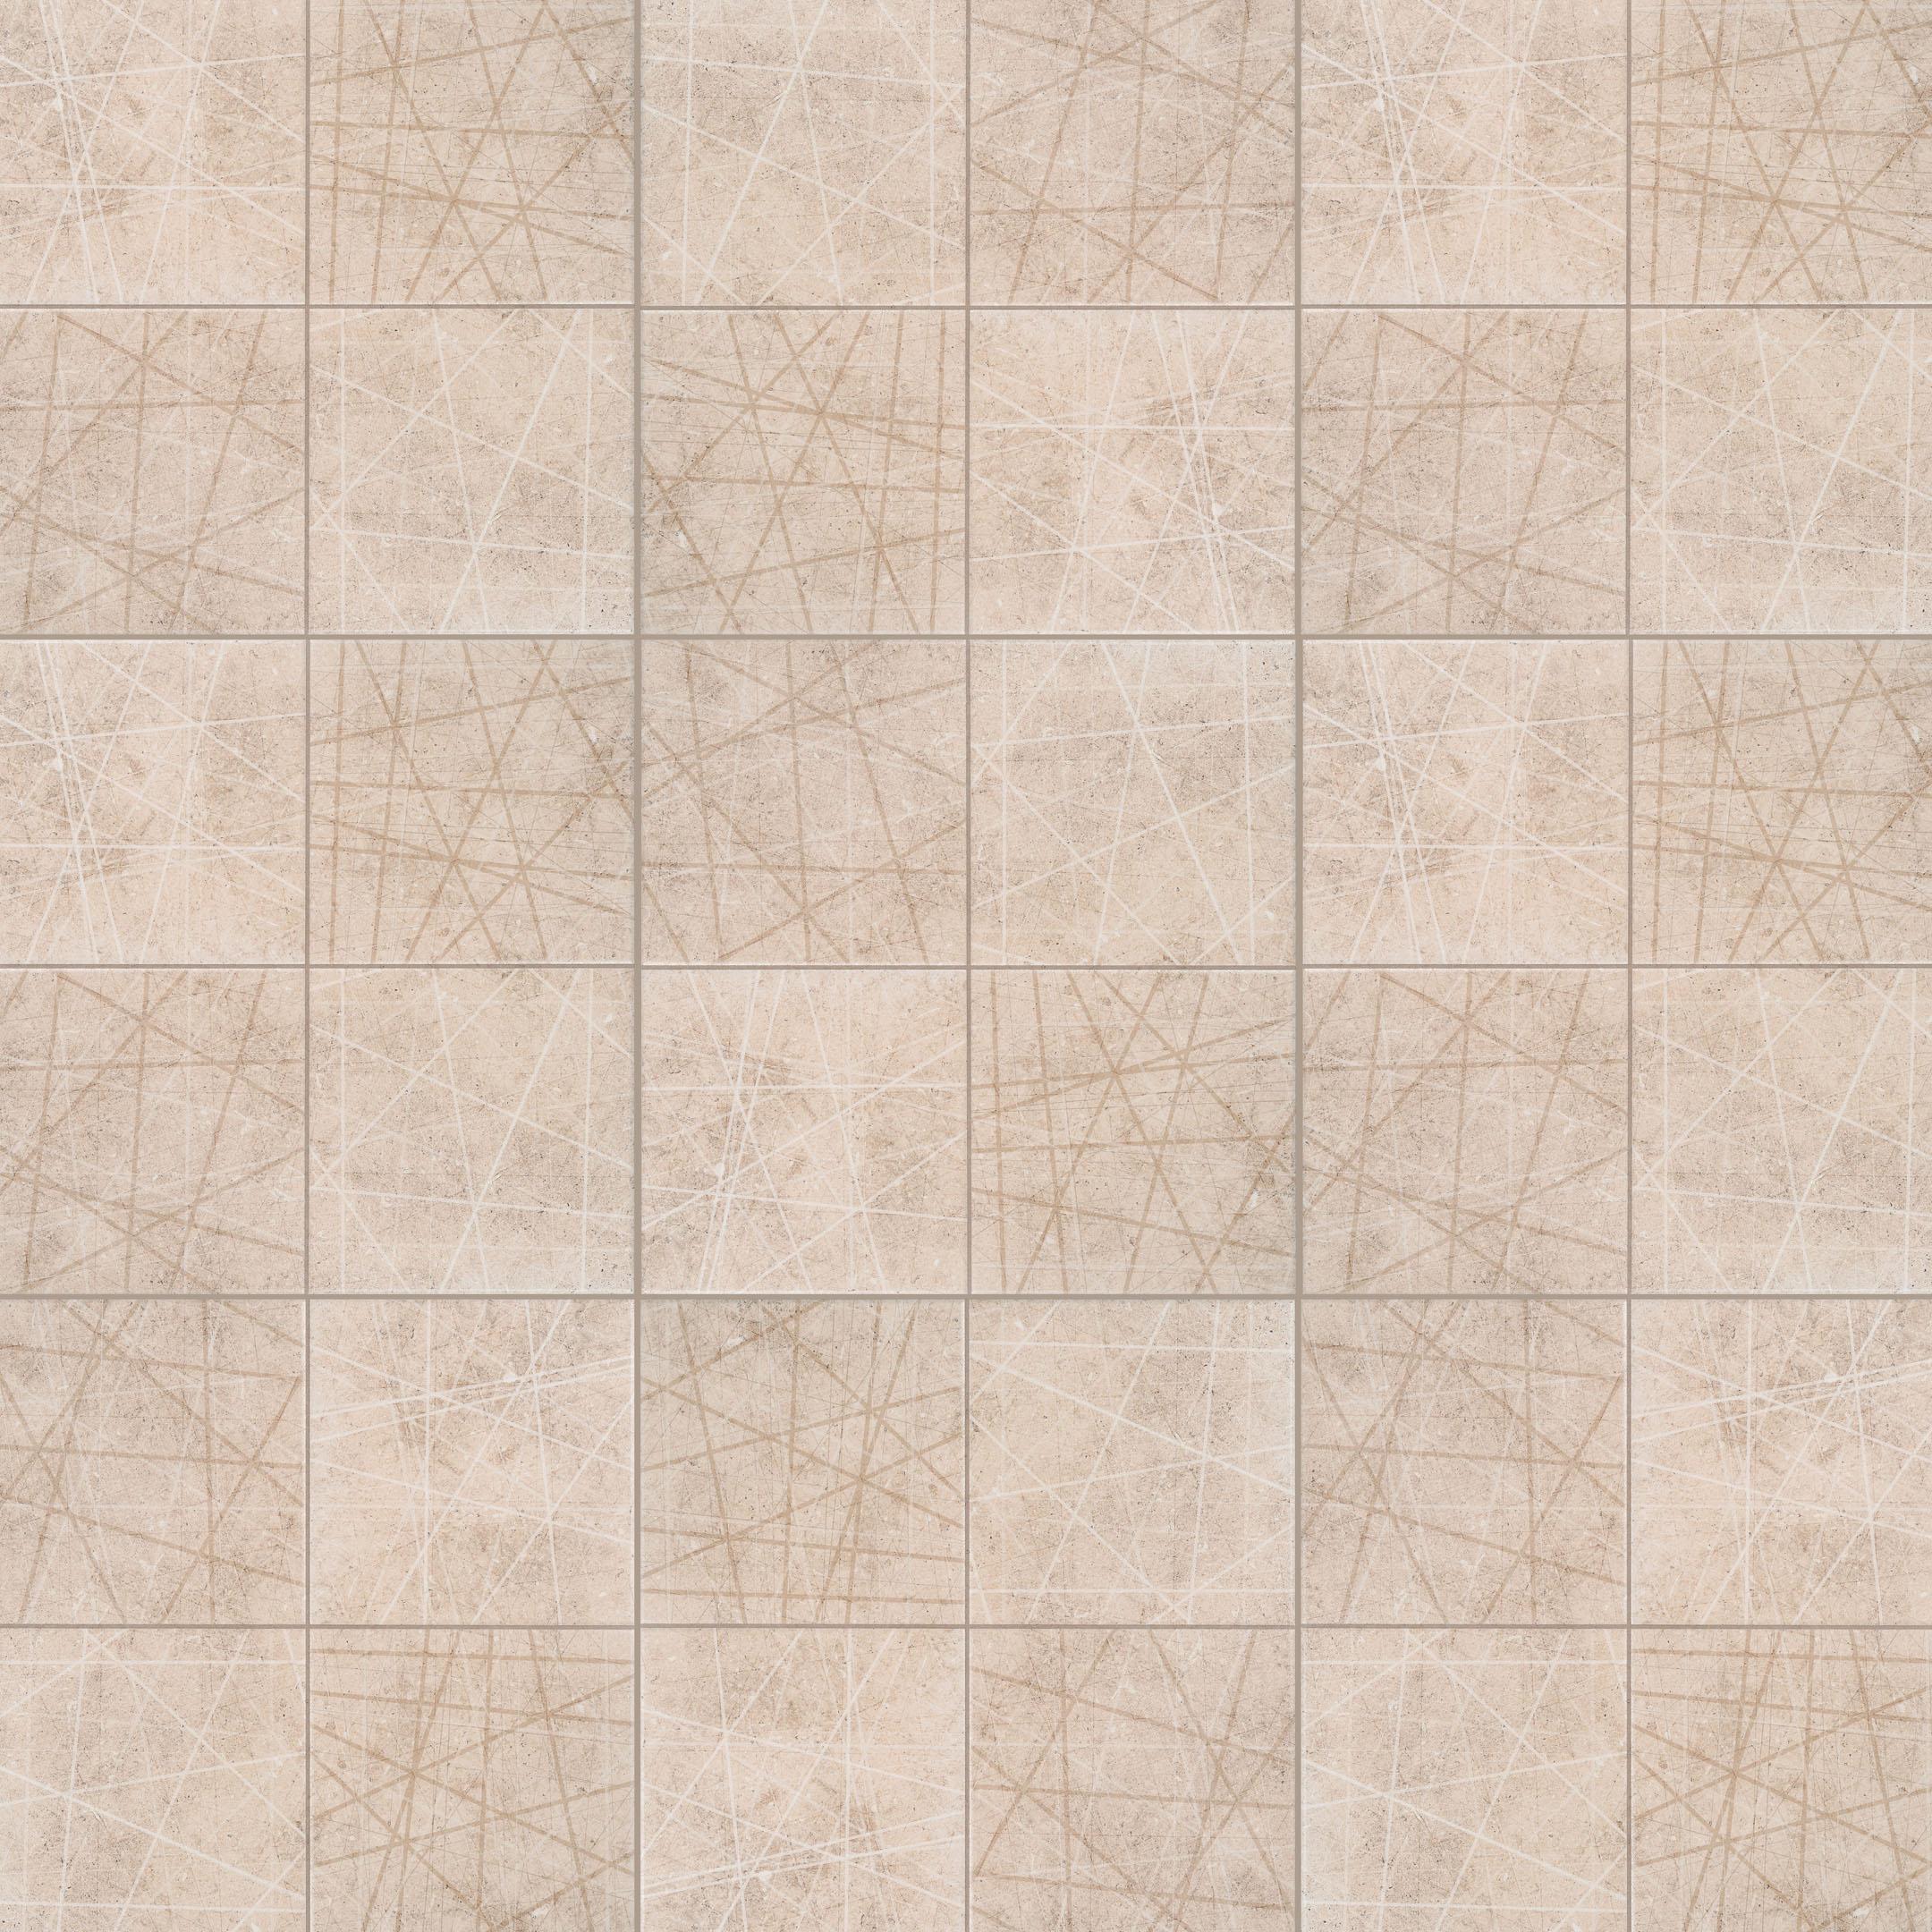 Керамогранит Керамин Авалон 3Д бежевый с декором 500х500х9 мм (5 шт.=1,25 кв.м) стоимость